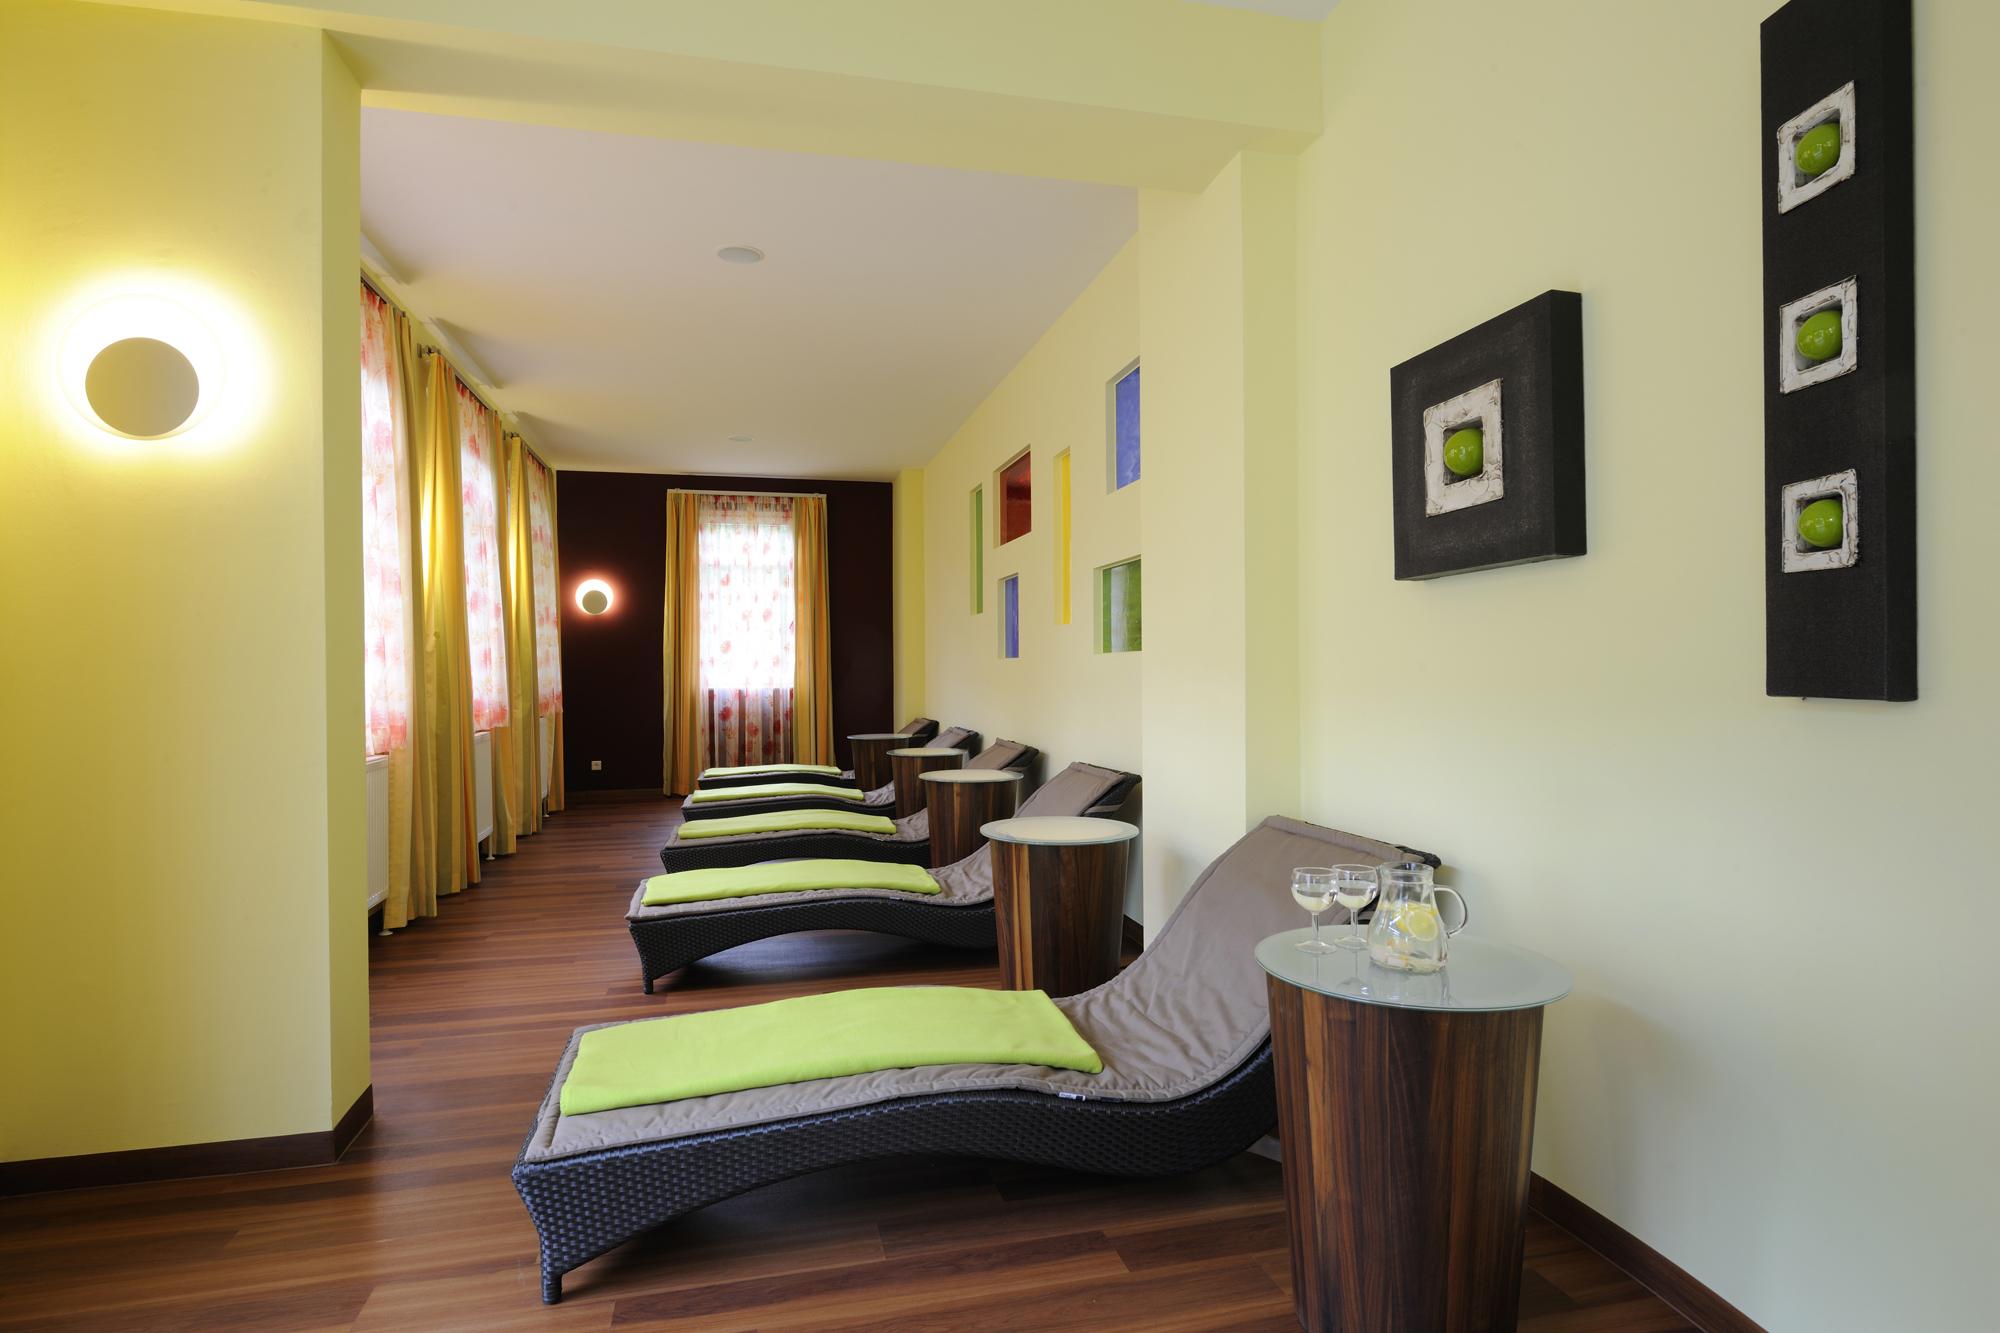 Johannesbad Hotel Phönix Bild3